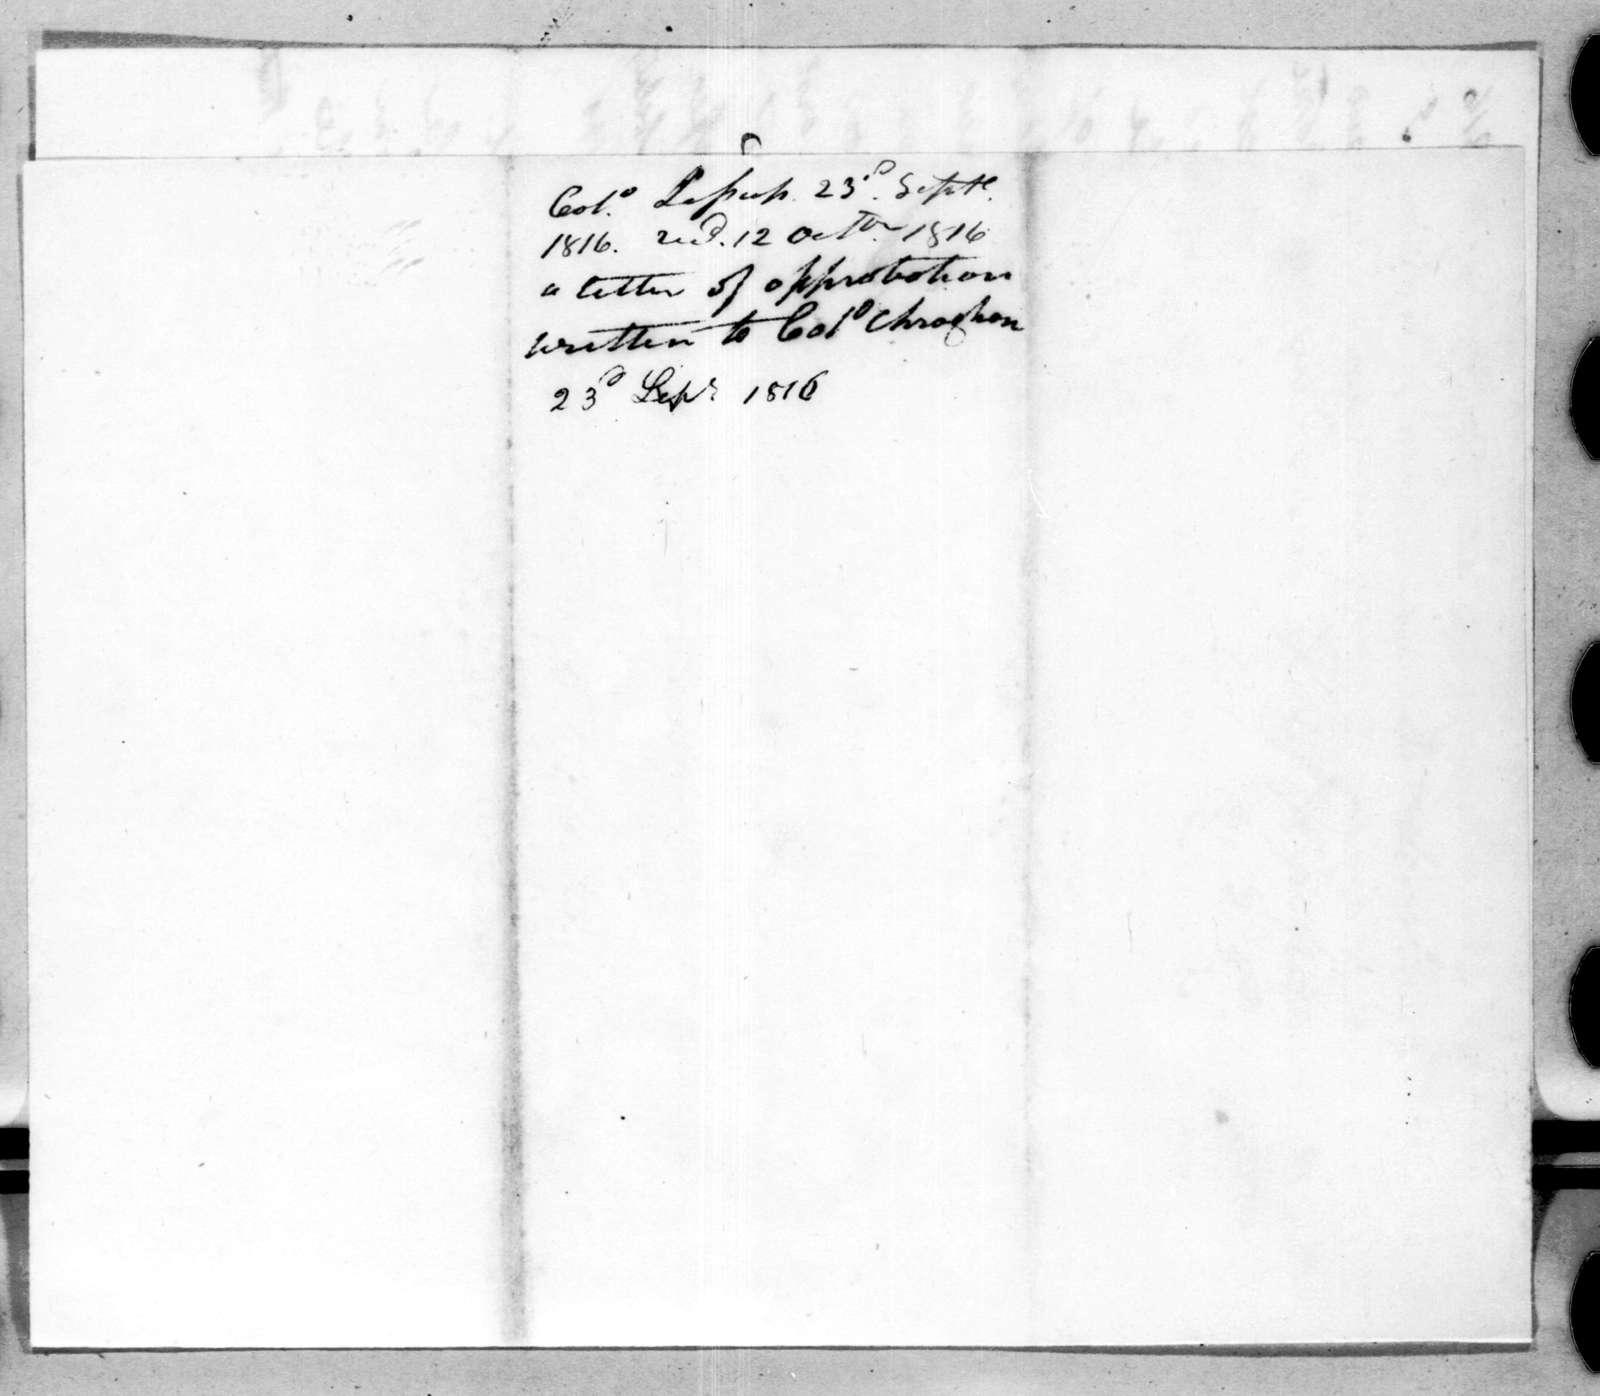 Thomas Sidney Jesup to Andrew Jackson, September 23, 1816